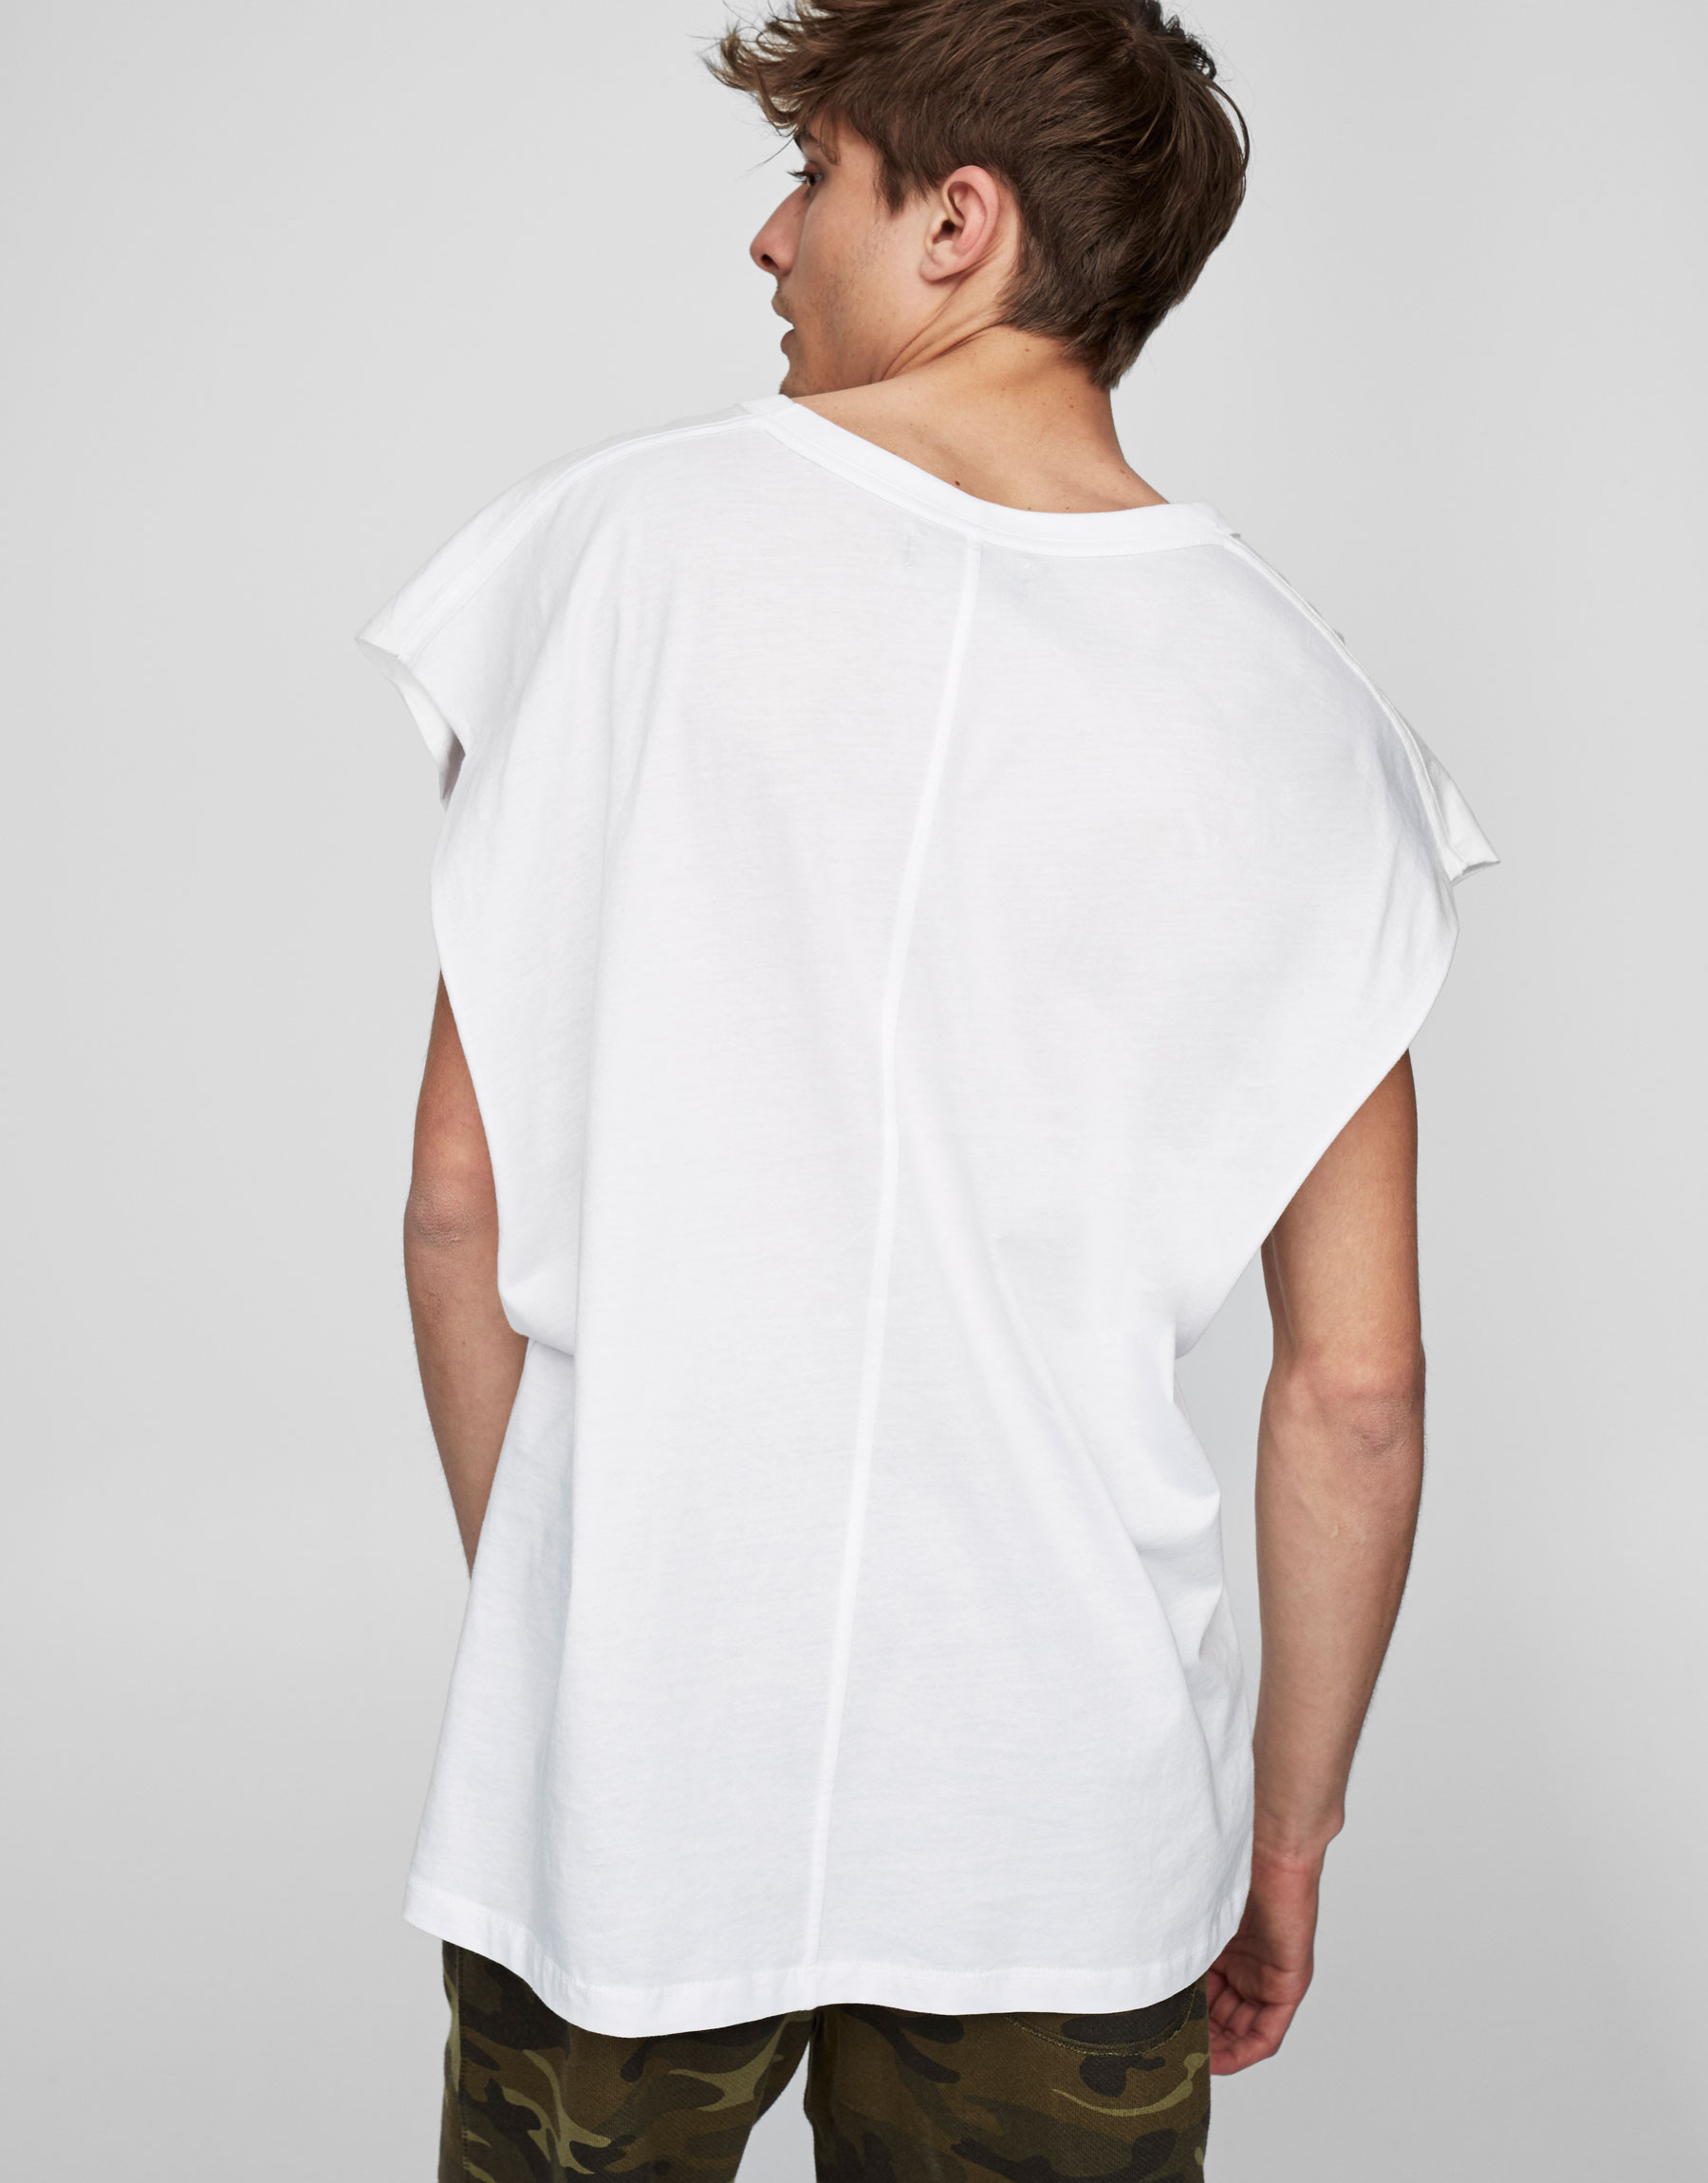 Camiseta manga escave moda